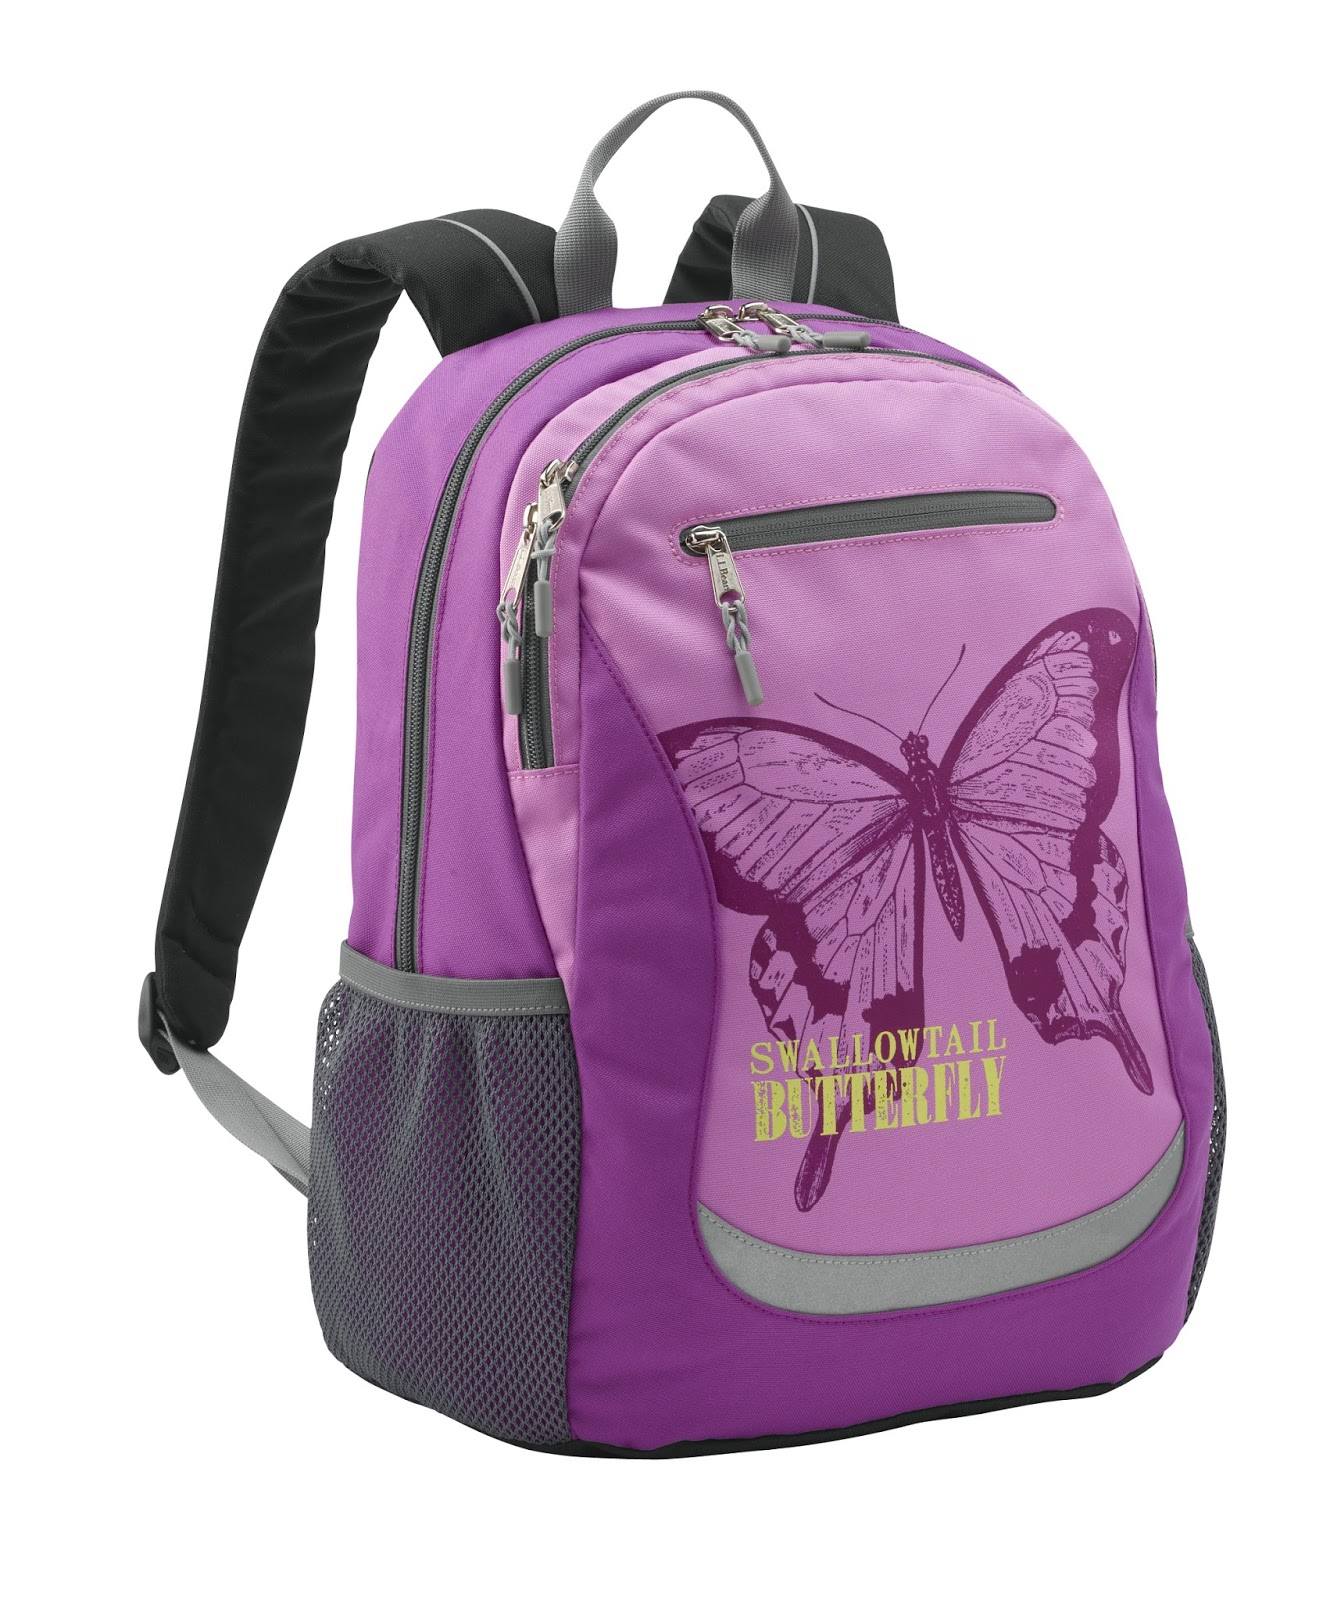 Should I order a backpack Madina (Avon) Reviews